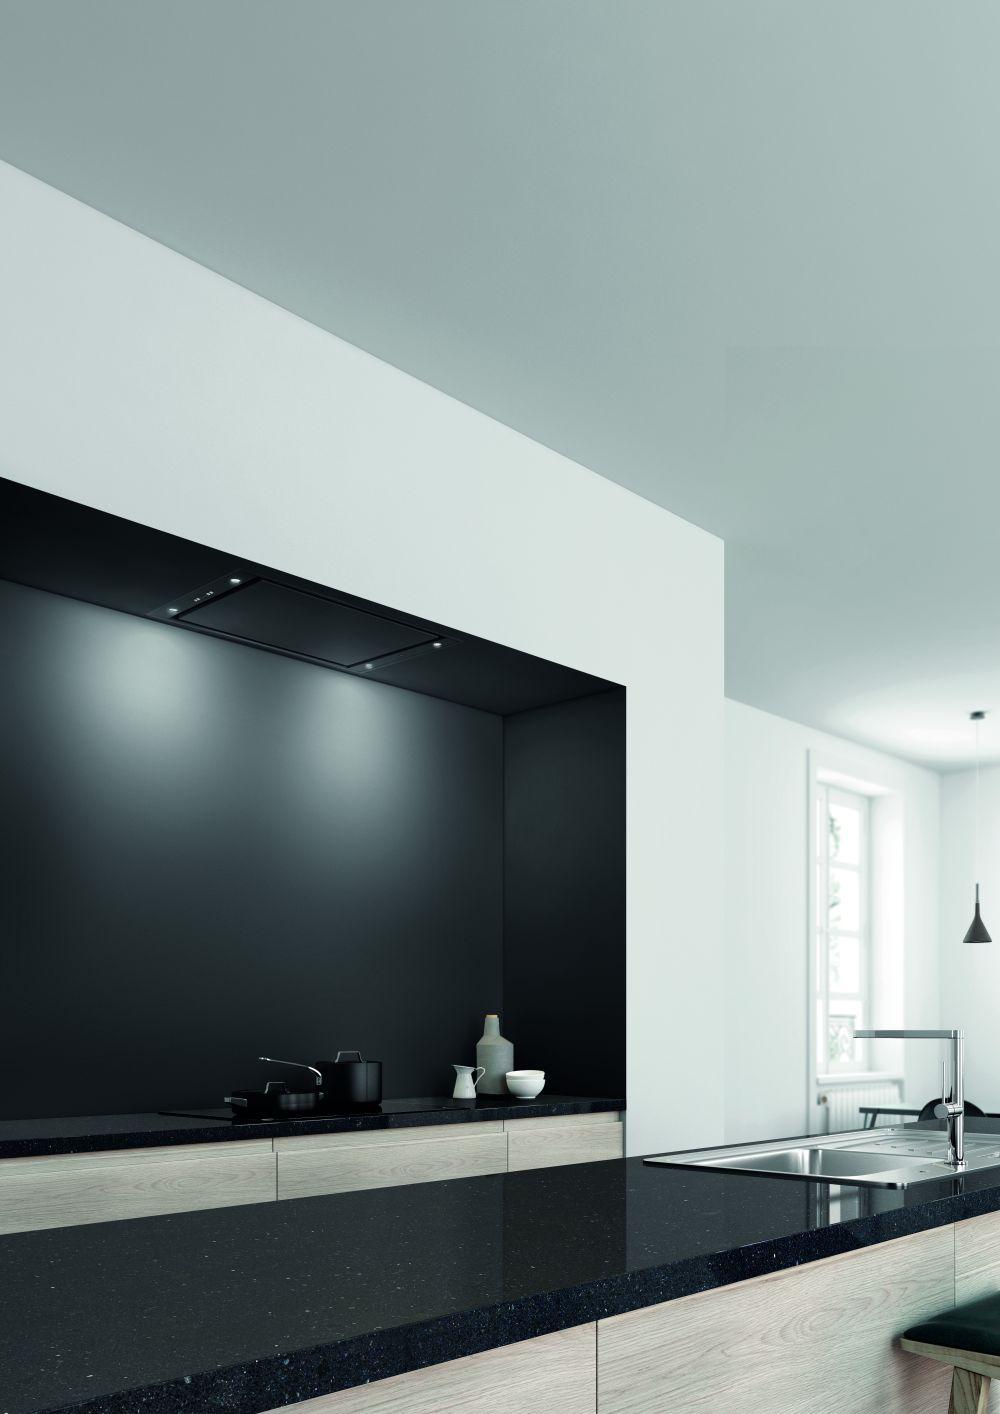 6832 Pureline black 90cm fot Novy Comitor